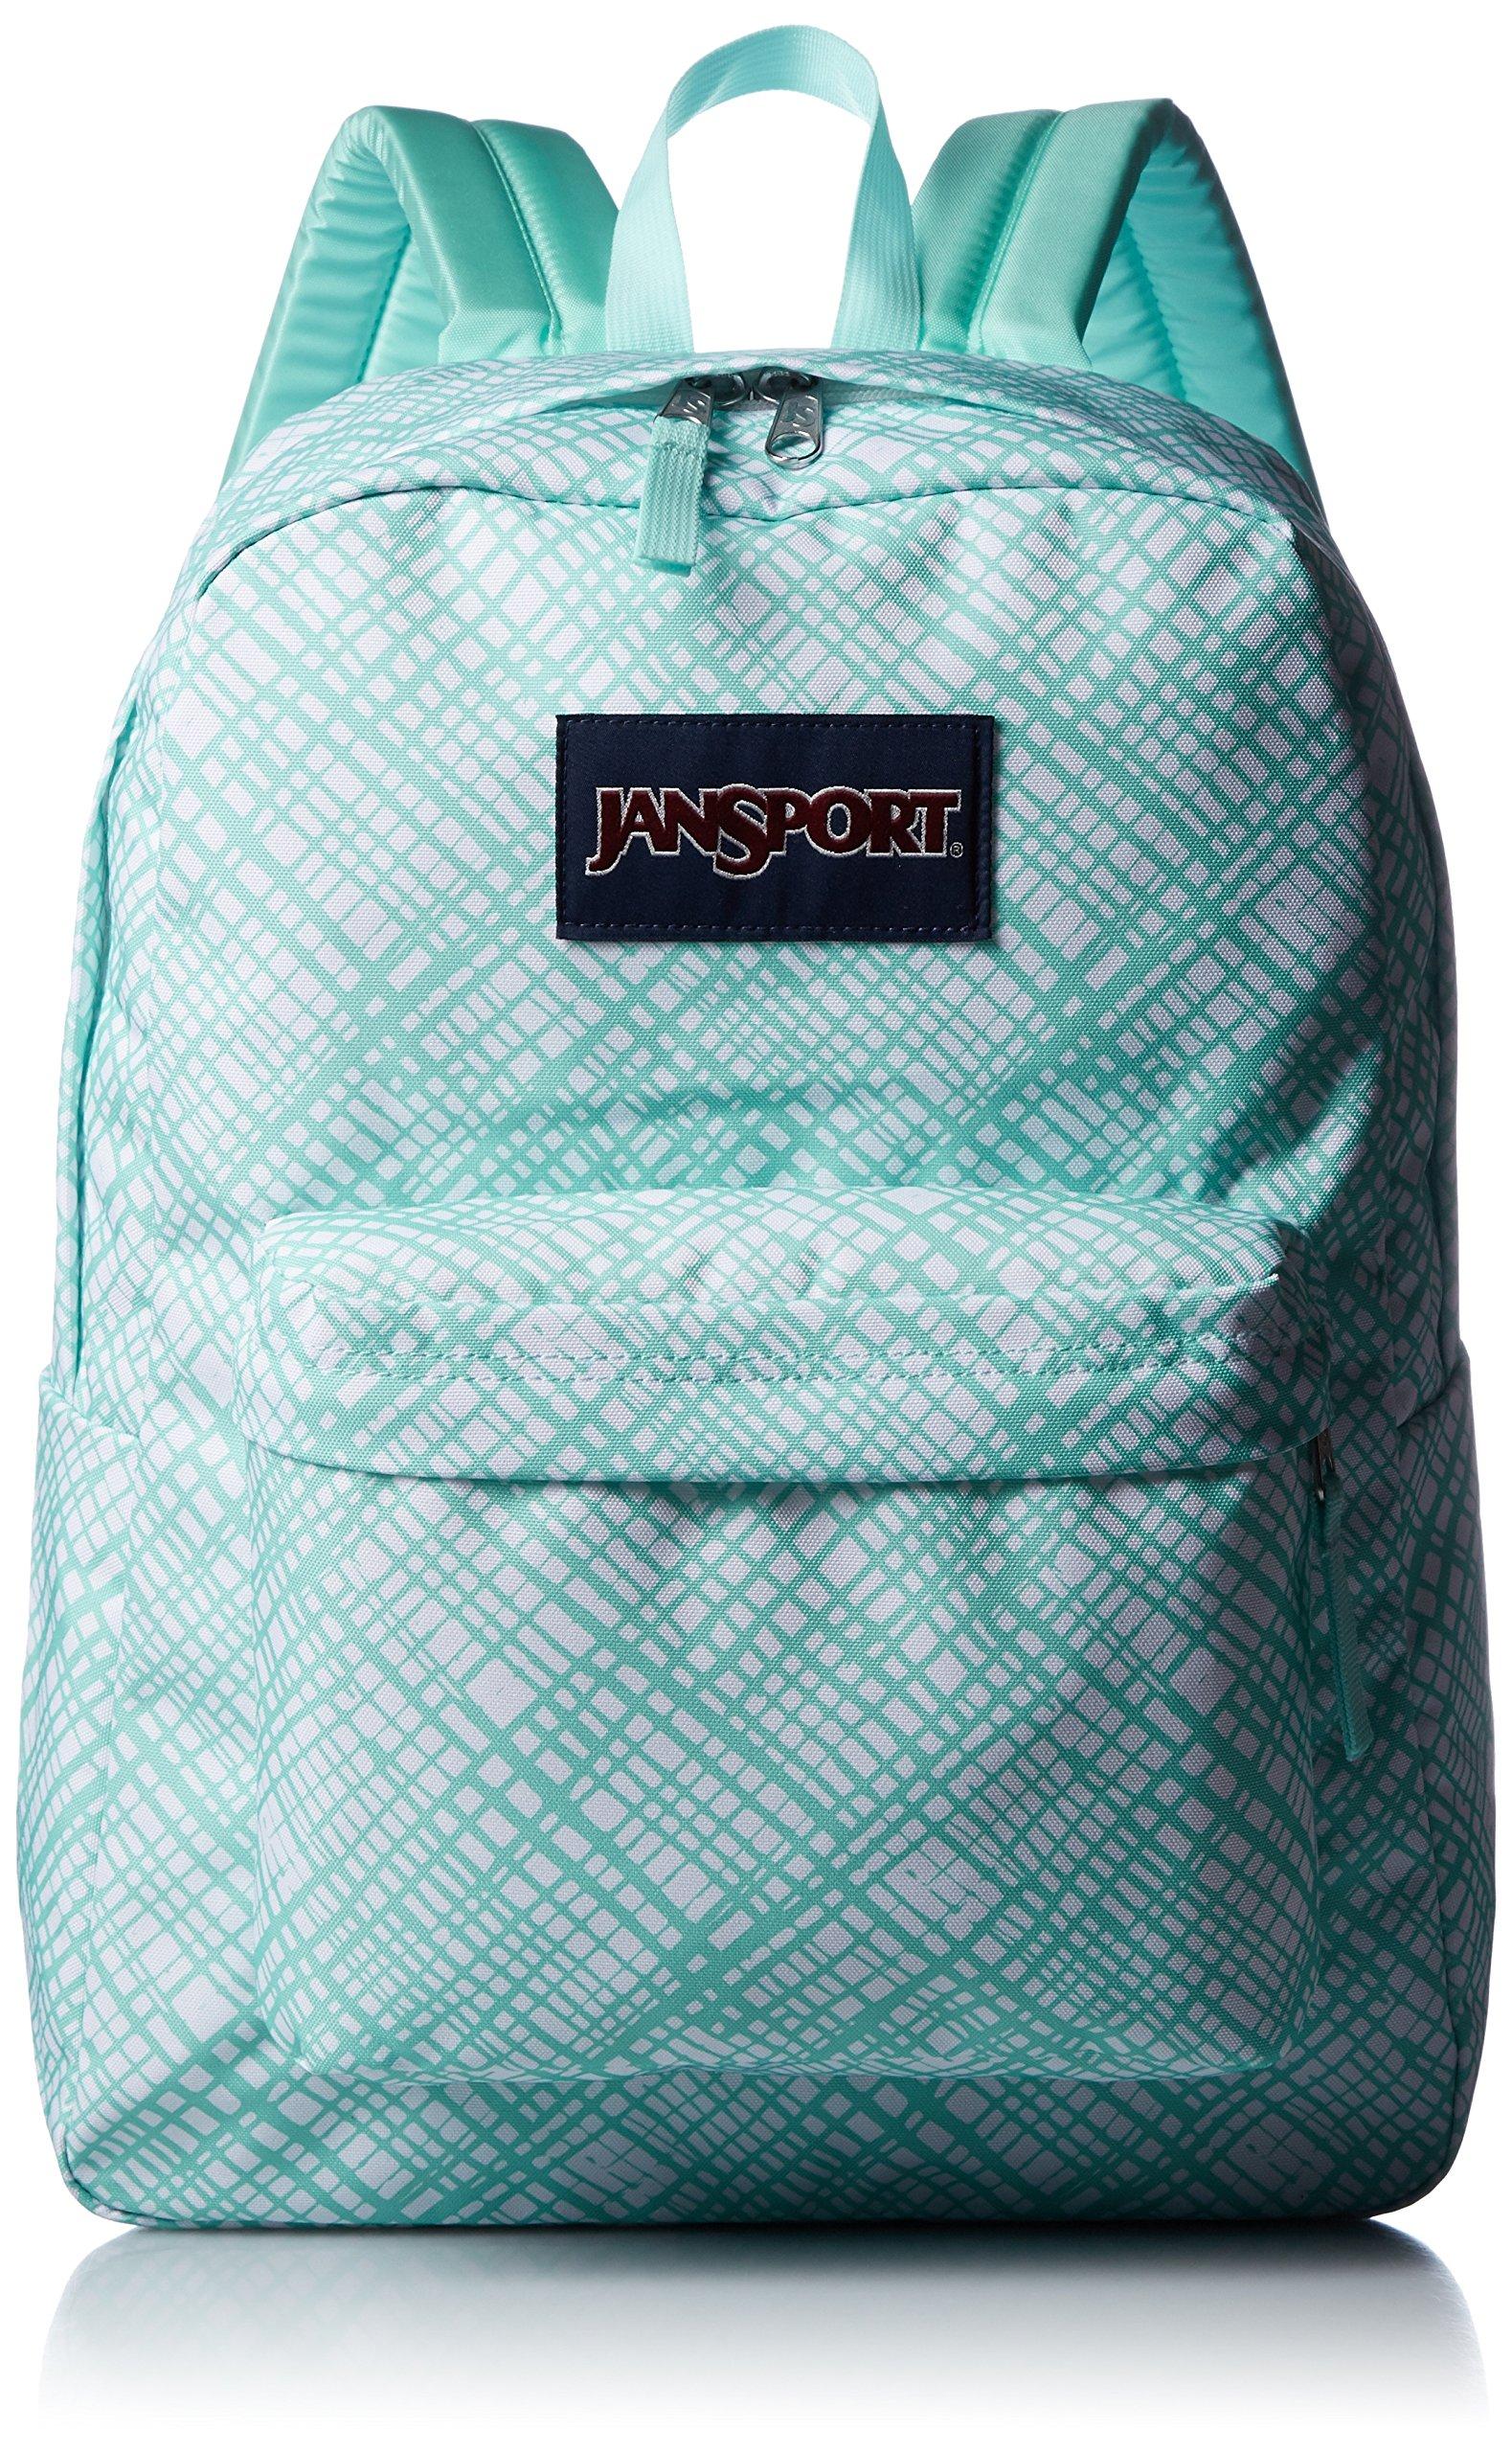 JanSport Womens Classic Mainstream Superbreak Backpack - Aqua Dash Jagged Plaid / 16.7'' H X 13'' W X 8.5'' D